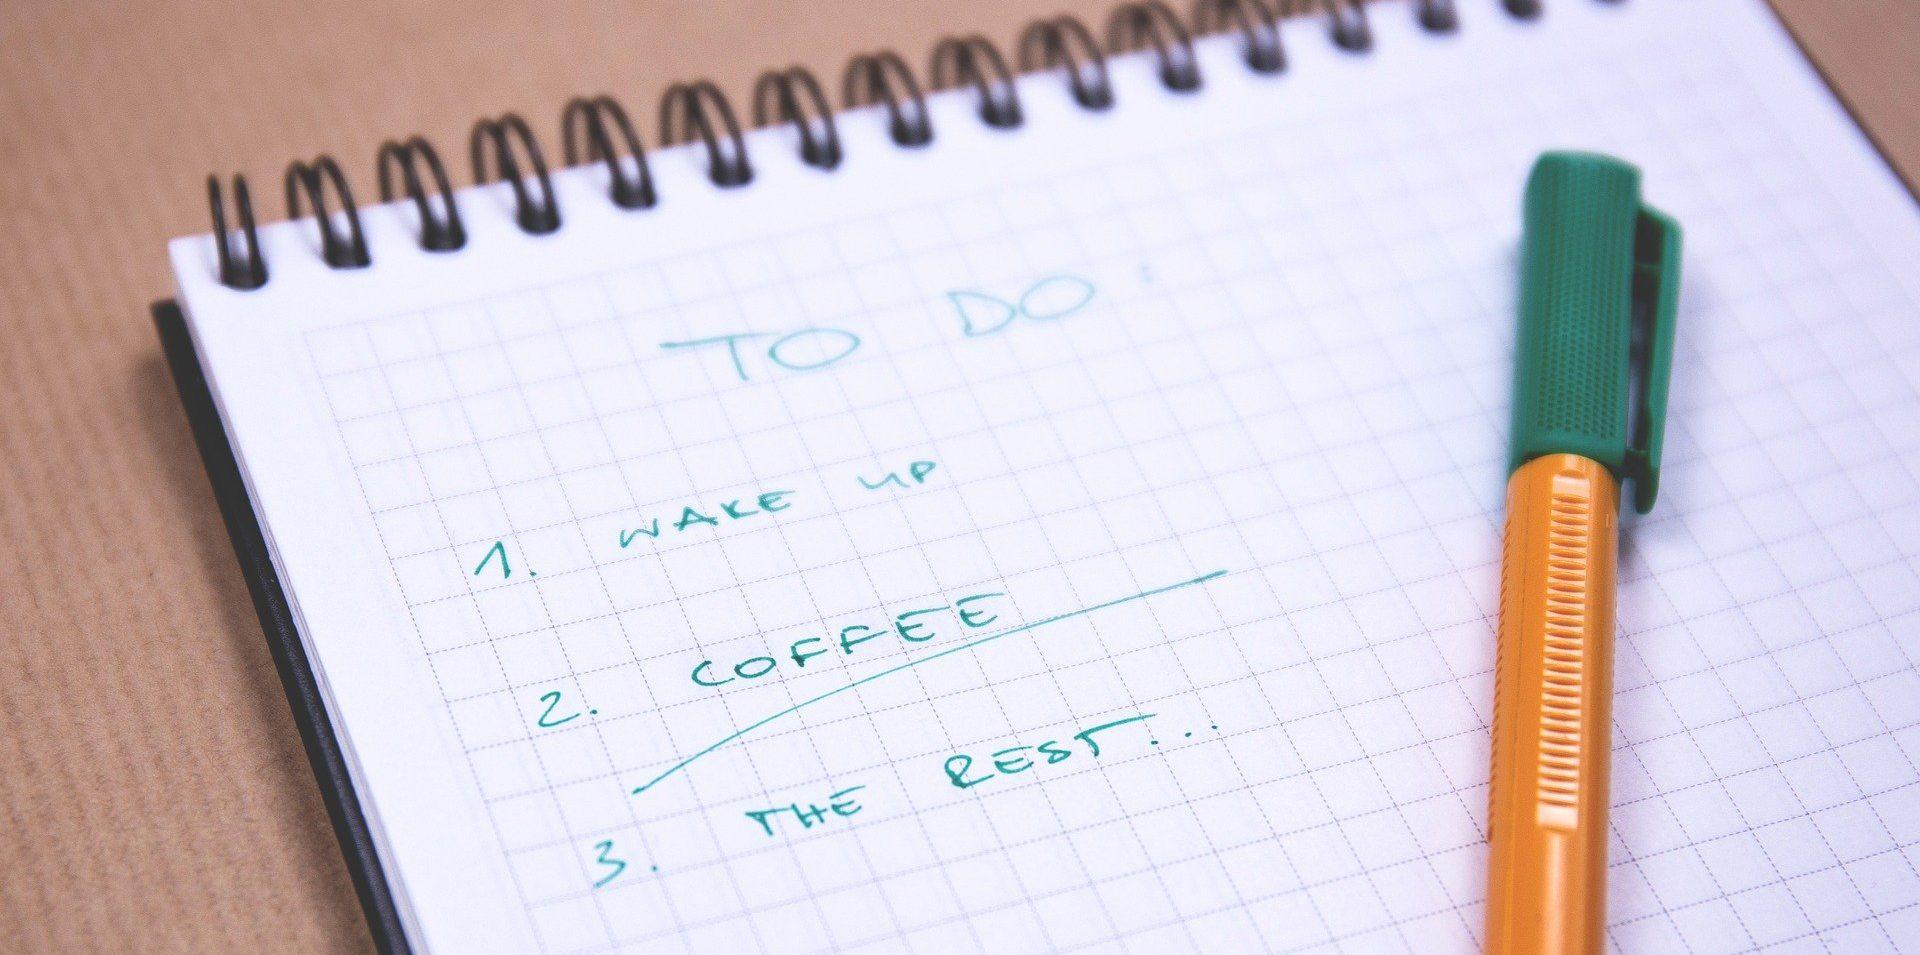 Image: Checklist with a pen